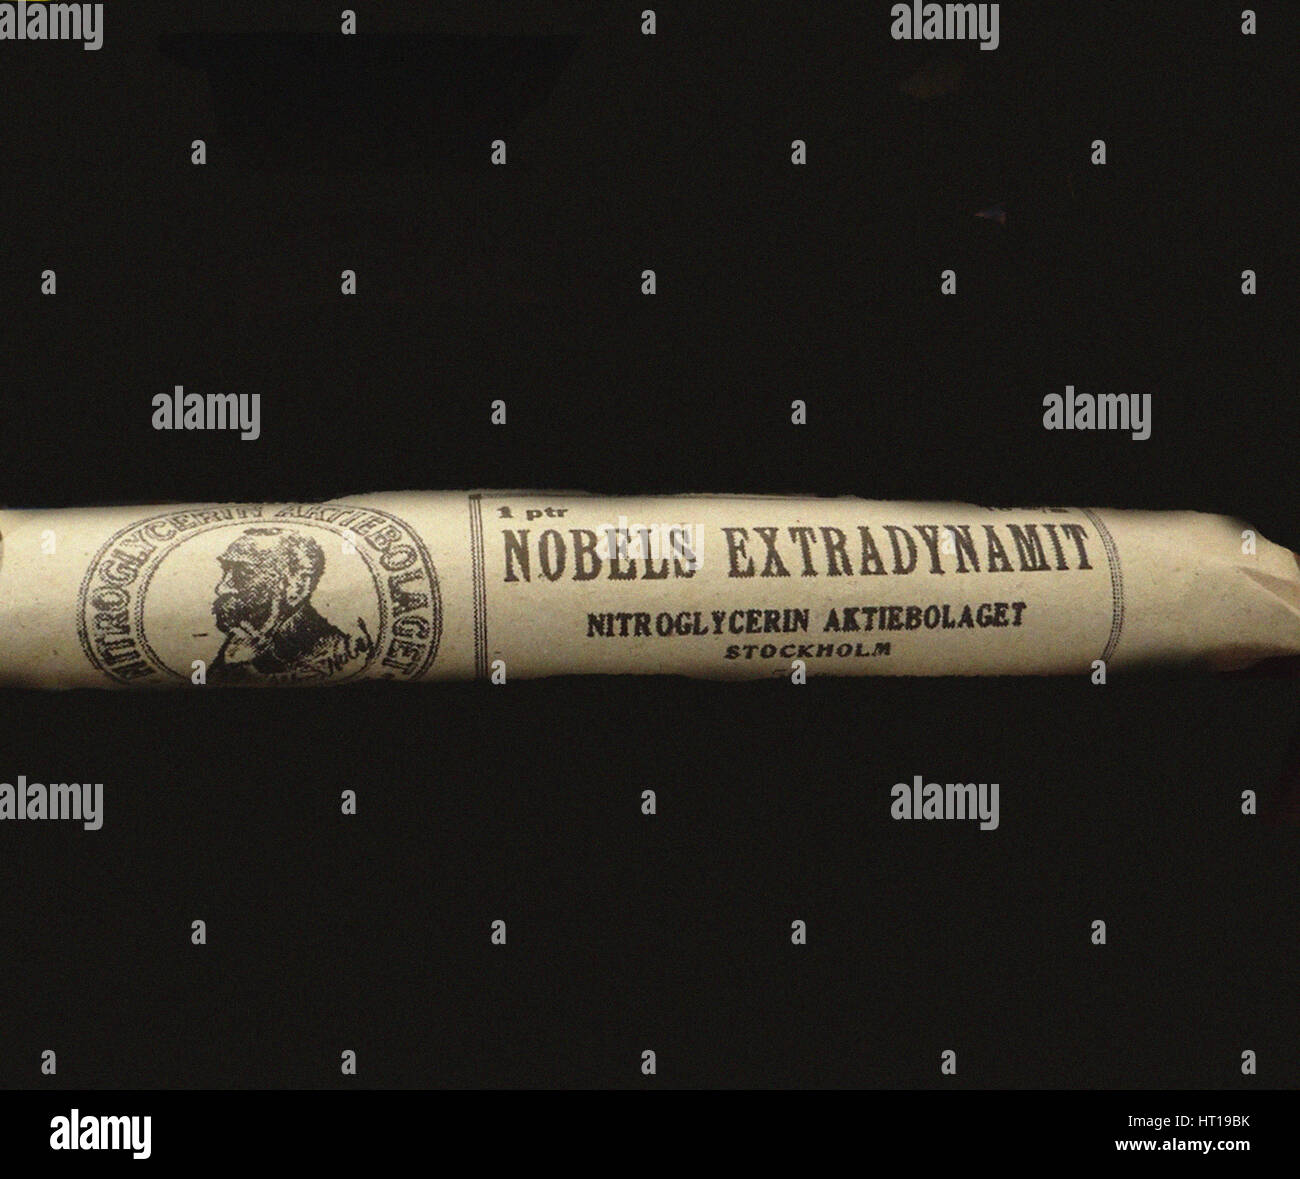 Le Prix Nobel est Extradynamit. Artiste: objet Historique Photo Stock